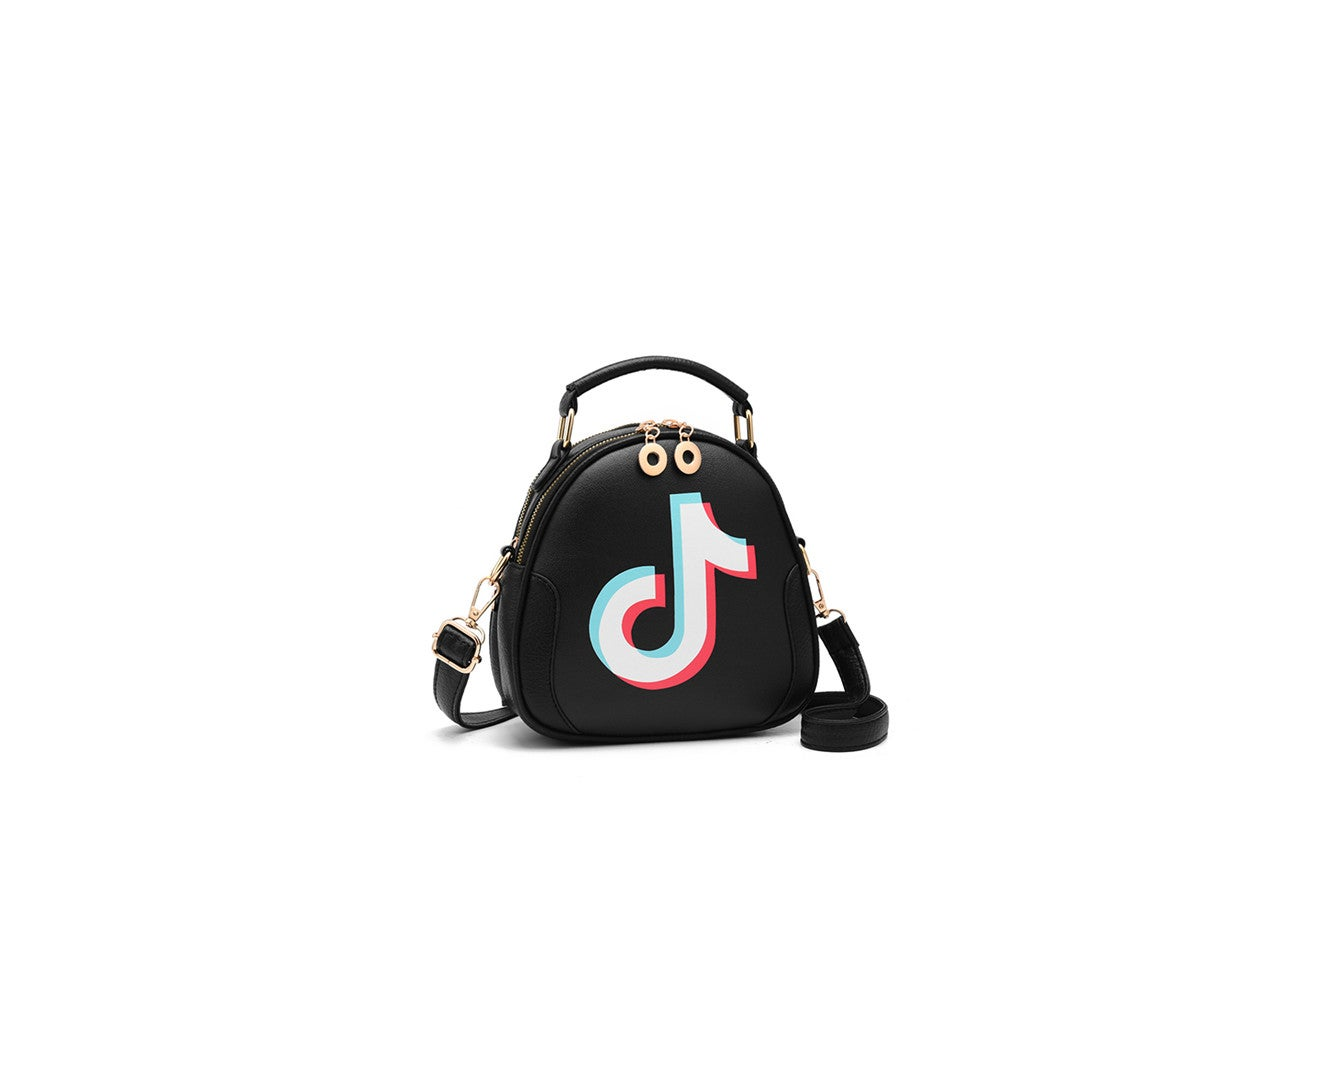 Fashion Satchel Purse Handbag Summer Bag Literature and Art Slant Single Shoulder Bag for Women-5